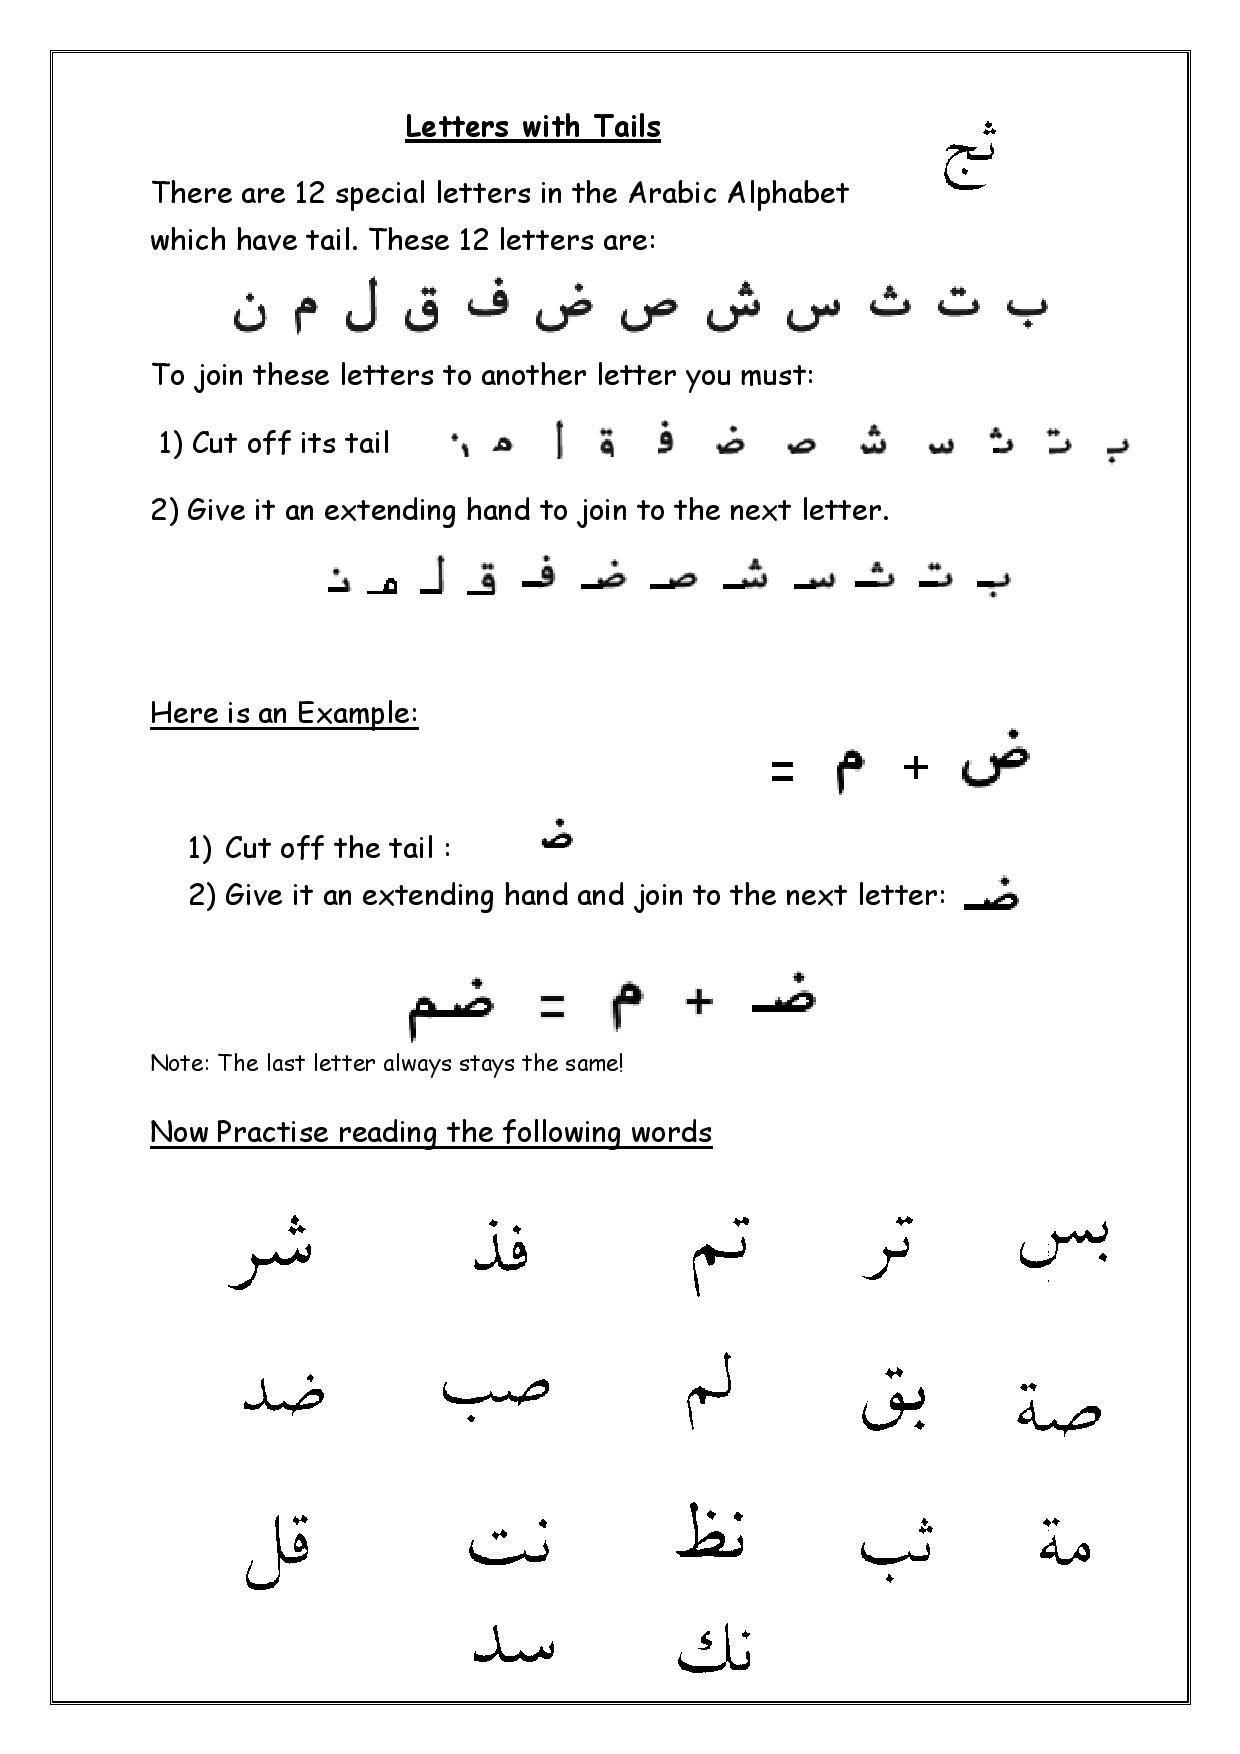 Arabic Grammar Revision Sheet At Www Arabicadventures Com Learning Arabic Arabic Language Arabic Worksheets [ 1754 x 1240 Pixel ]